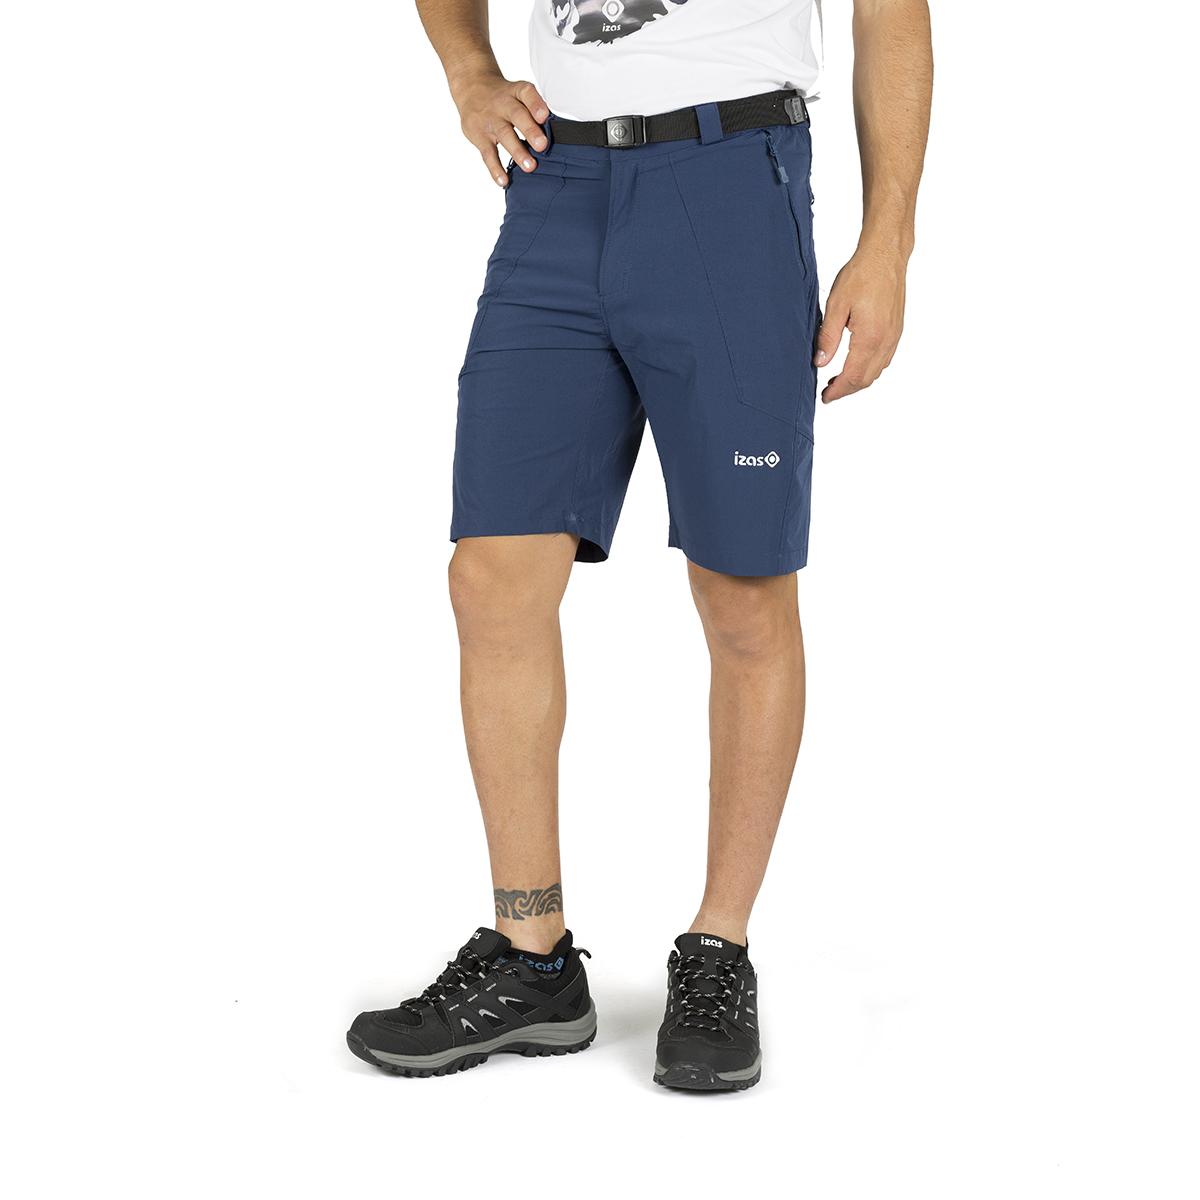 MAN'S PEAK STRETCH SHORT PANT BLUE